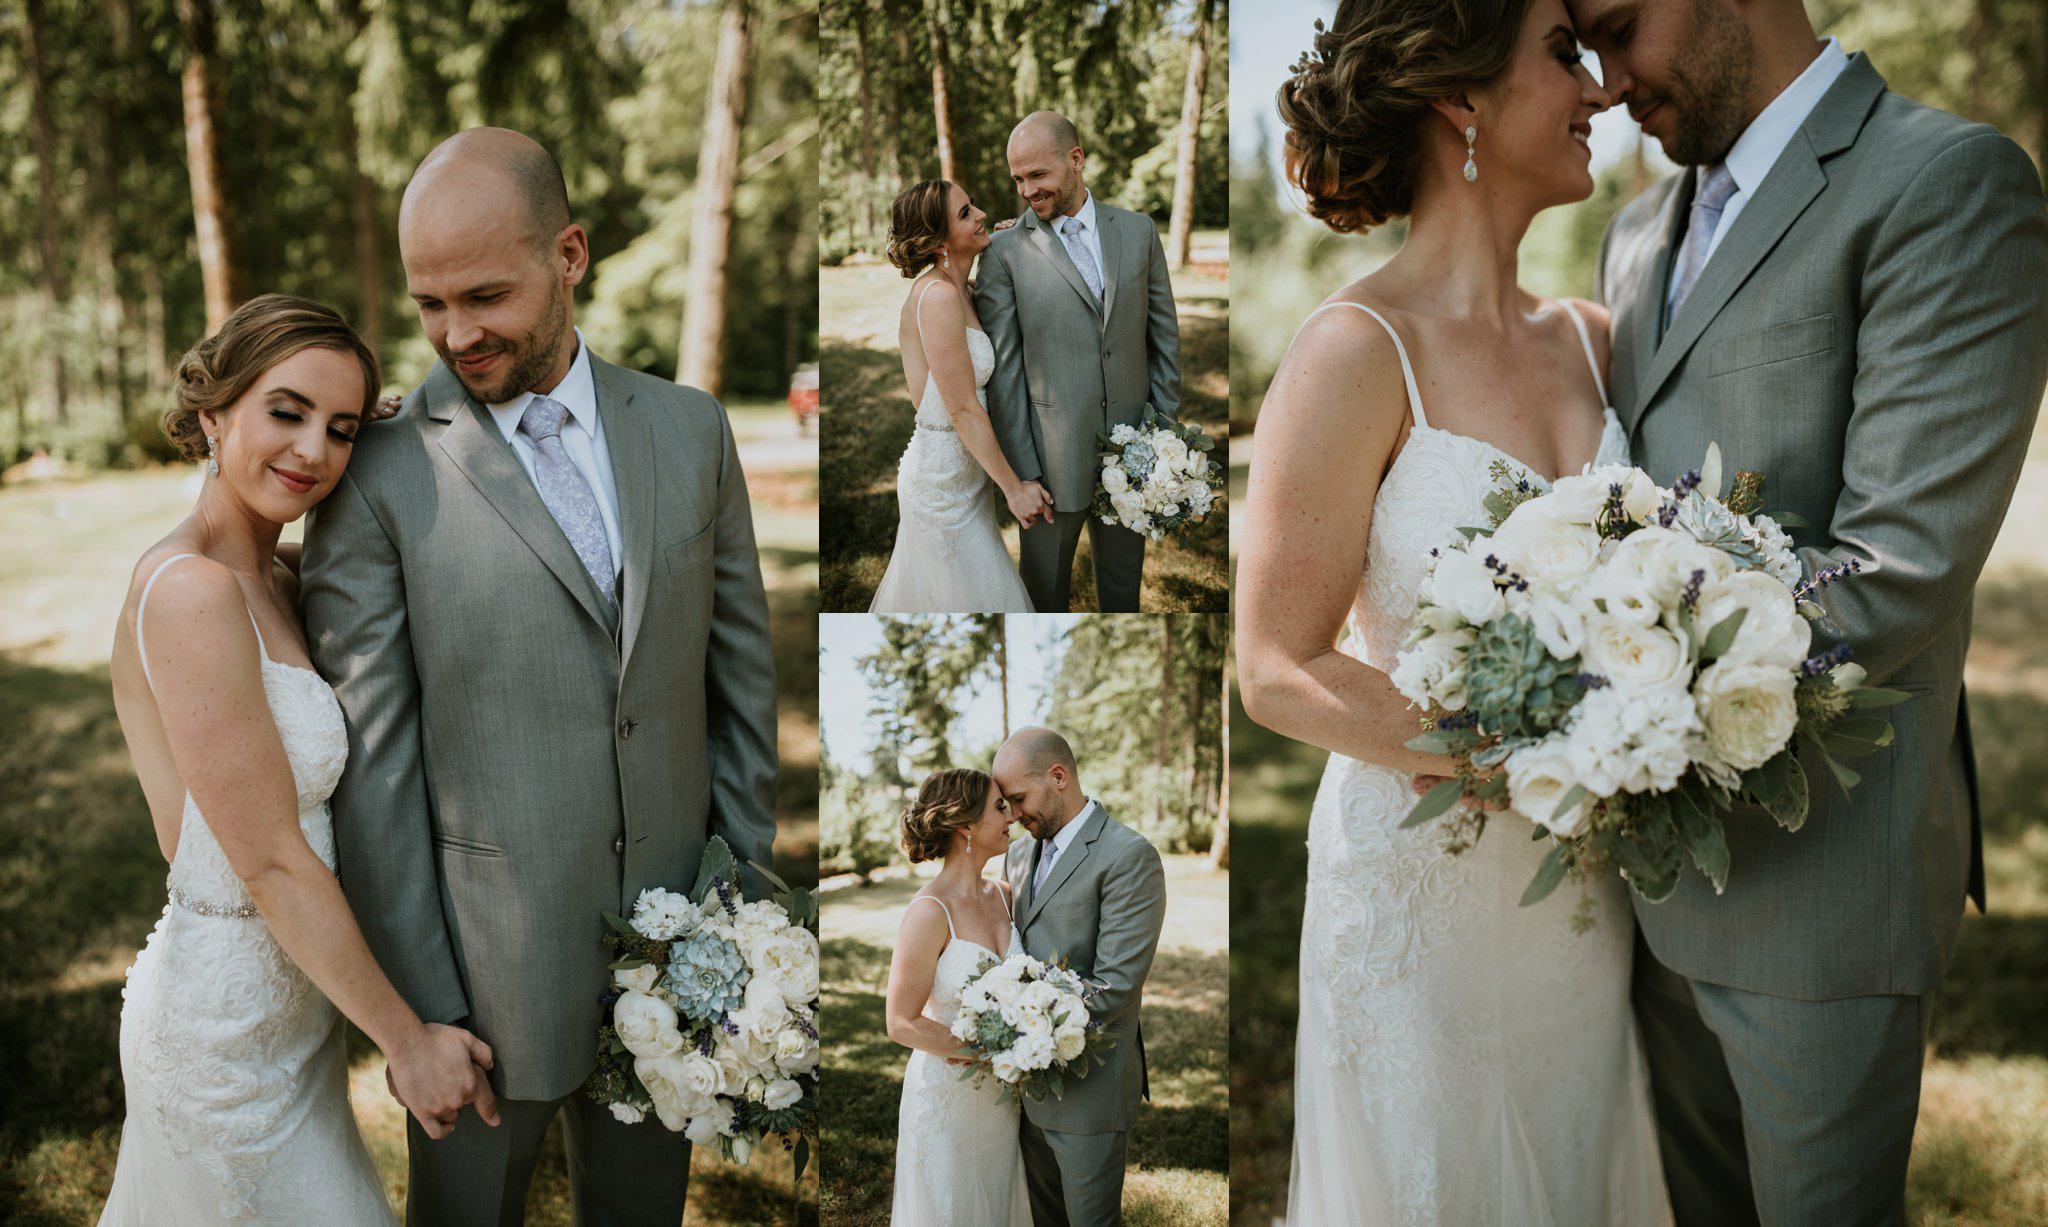 hollywood-school-house-wedding-seattle-photographer-caitlyn-nikula-41.jpg